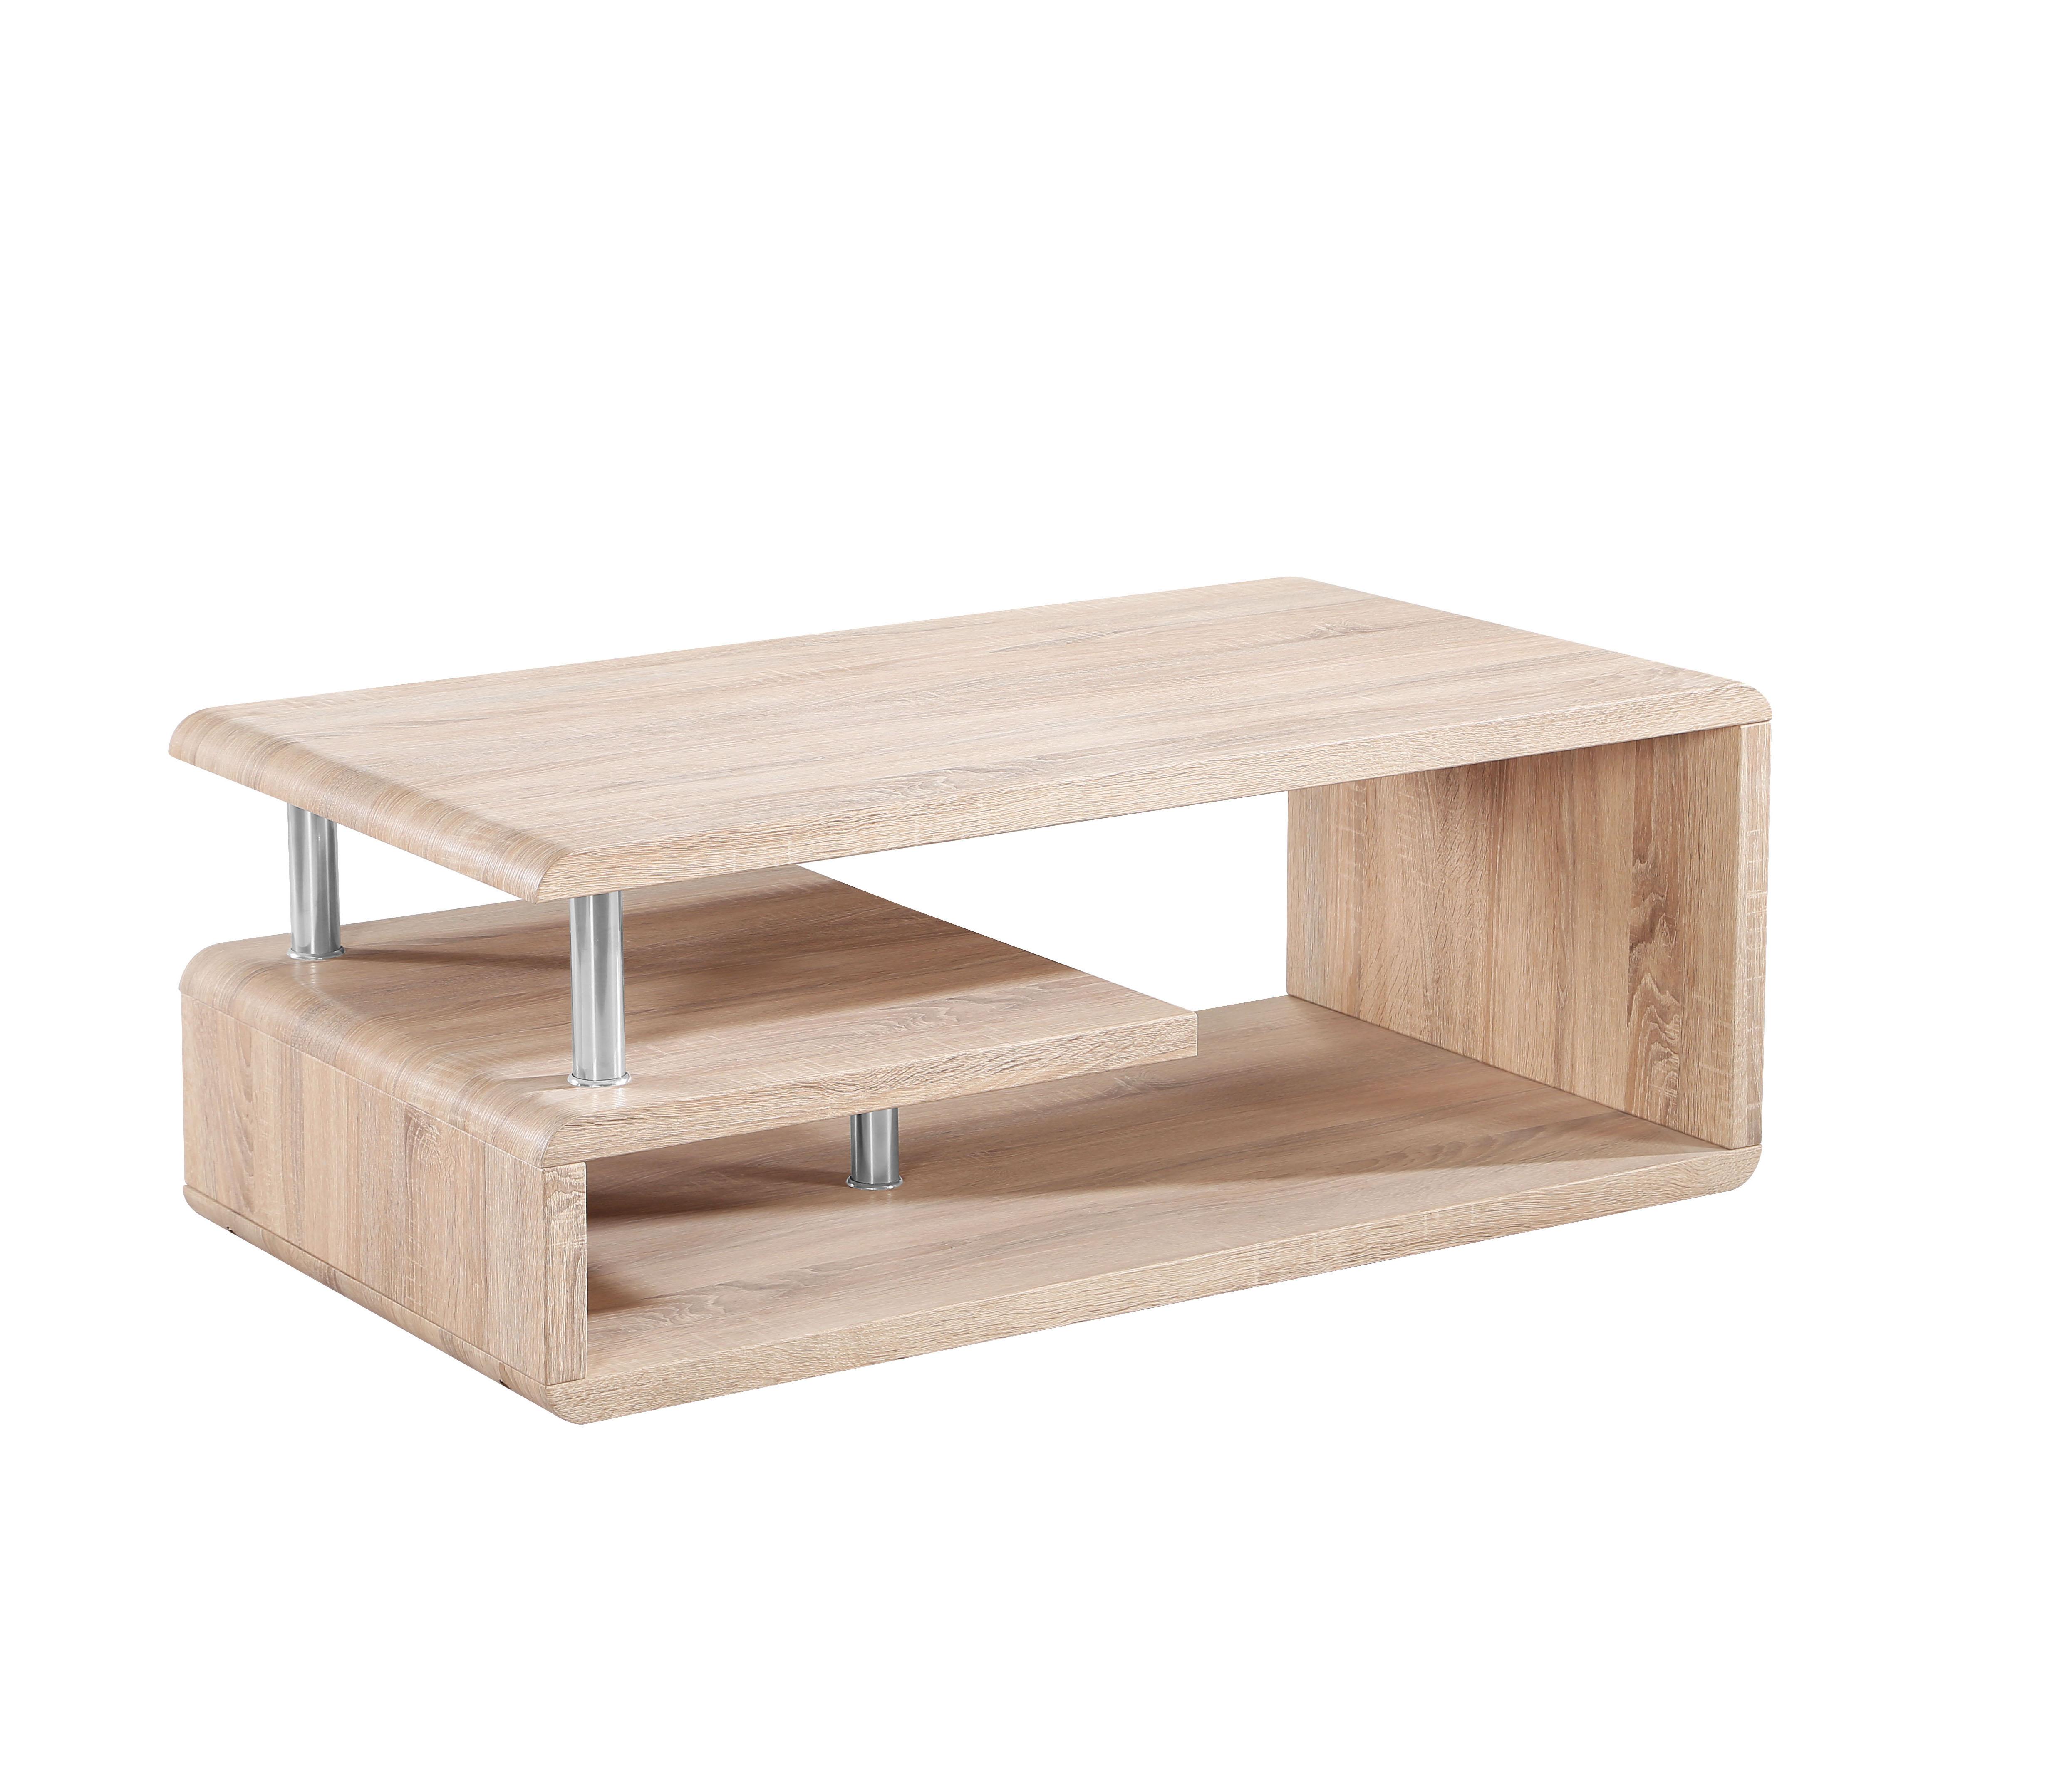 Wood Modern Center Table Latest Design Coffee Table For Sale Buy Wooden Coffee Tables Wooden Center Table Designs Coffee Table Modern Product On Alibaba Com